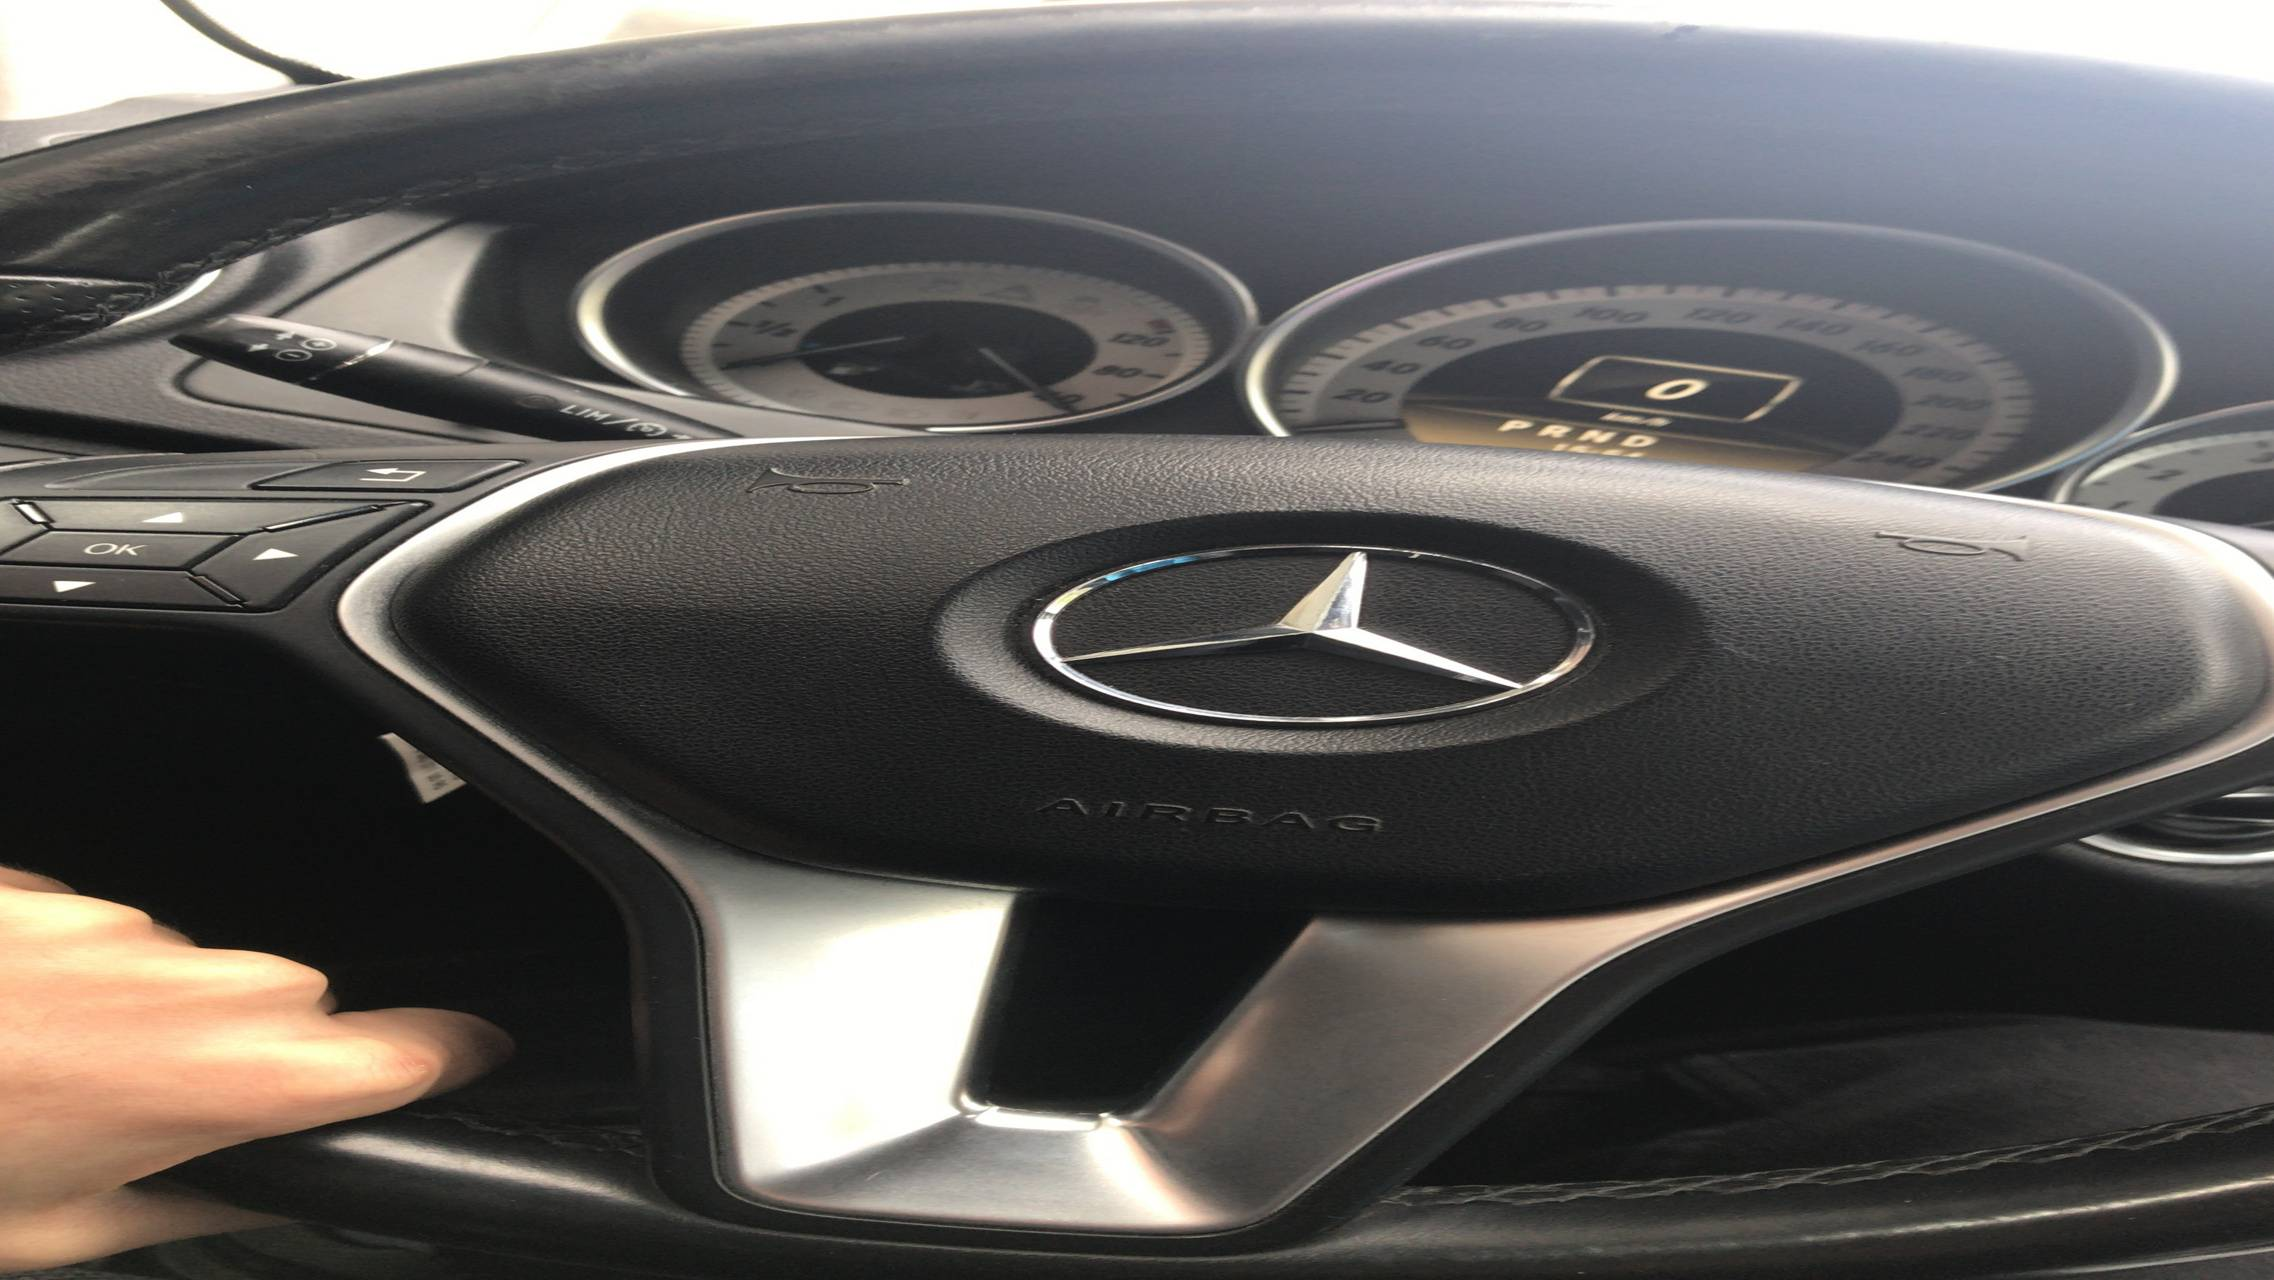 Mercedes console